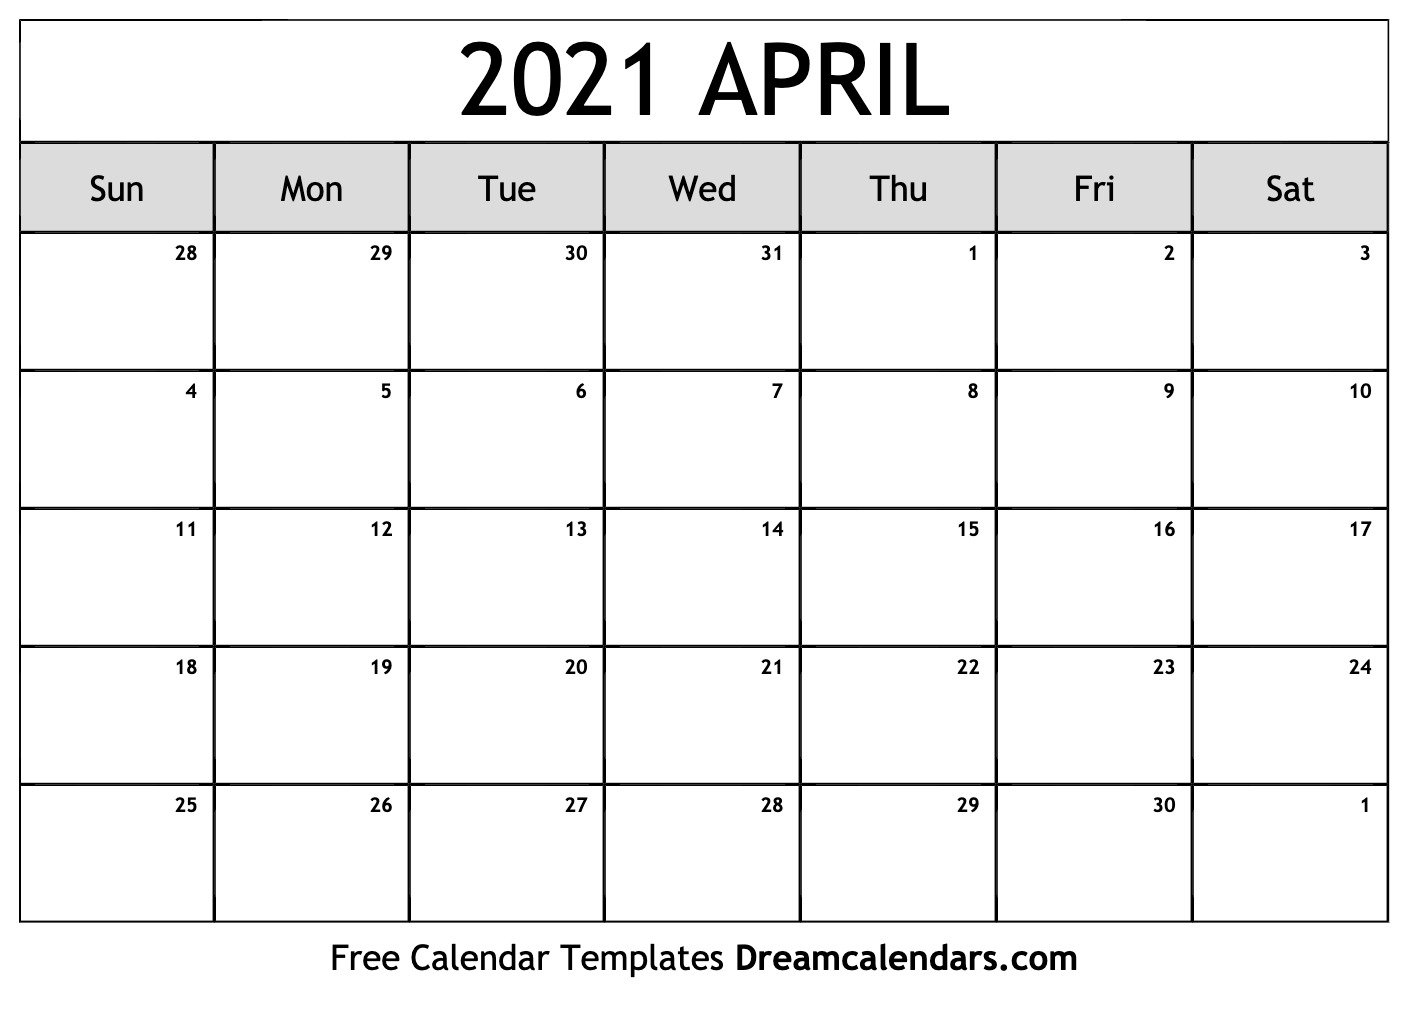 April 2021 Calendar | Free Blank Printable Templates 8X11 Sie Free April Calander